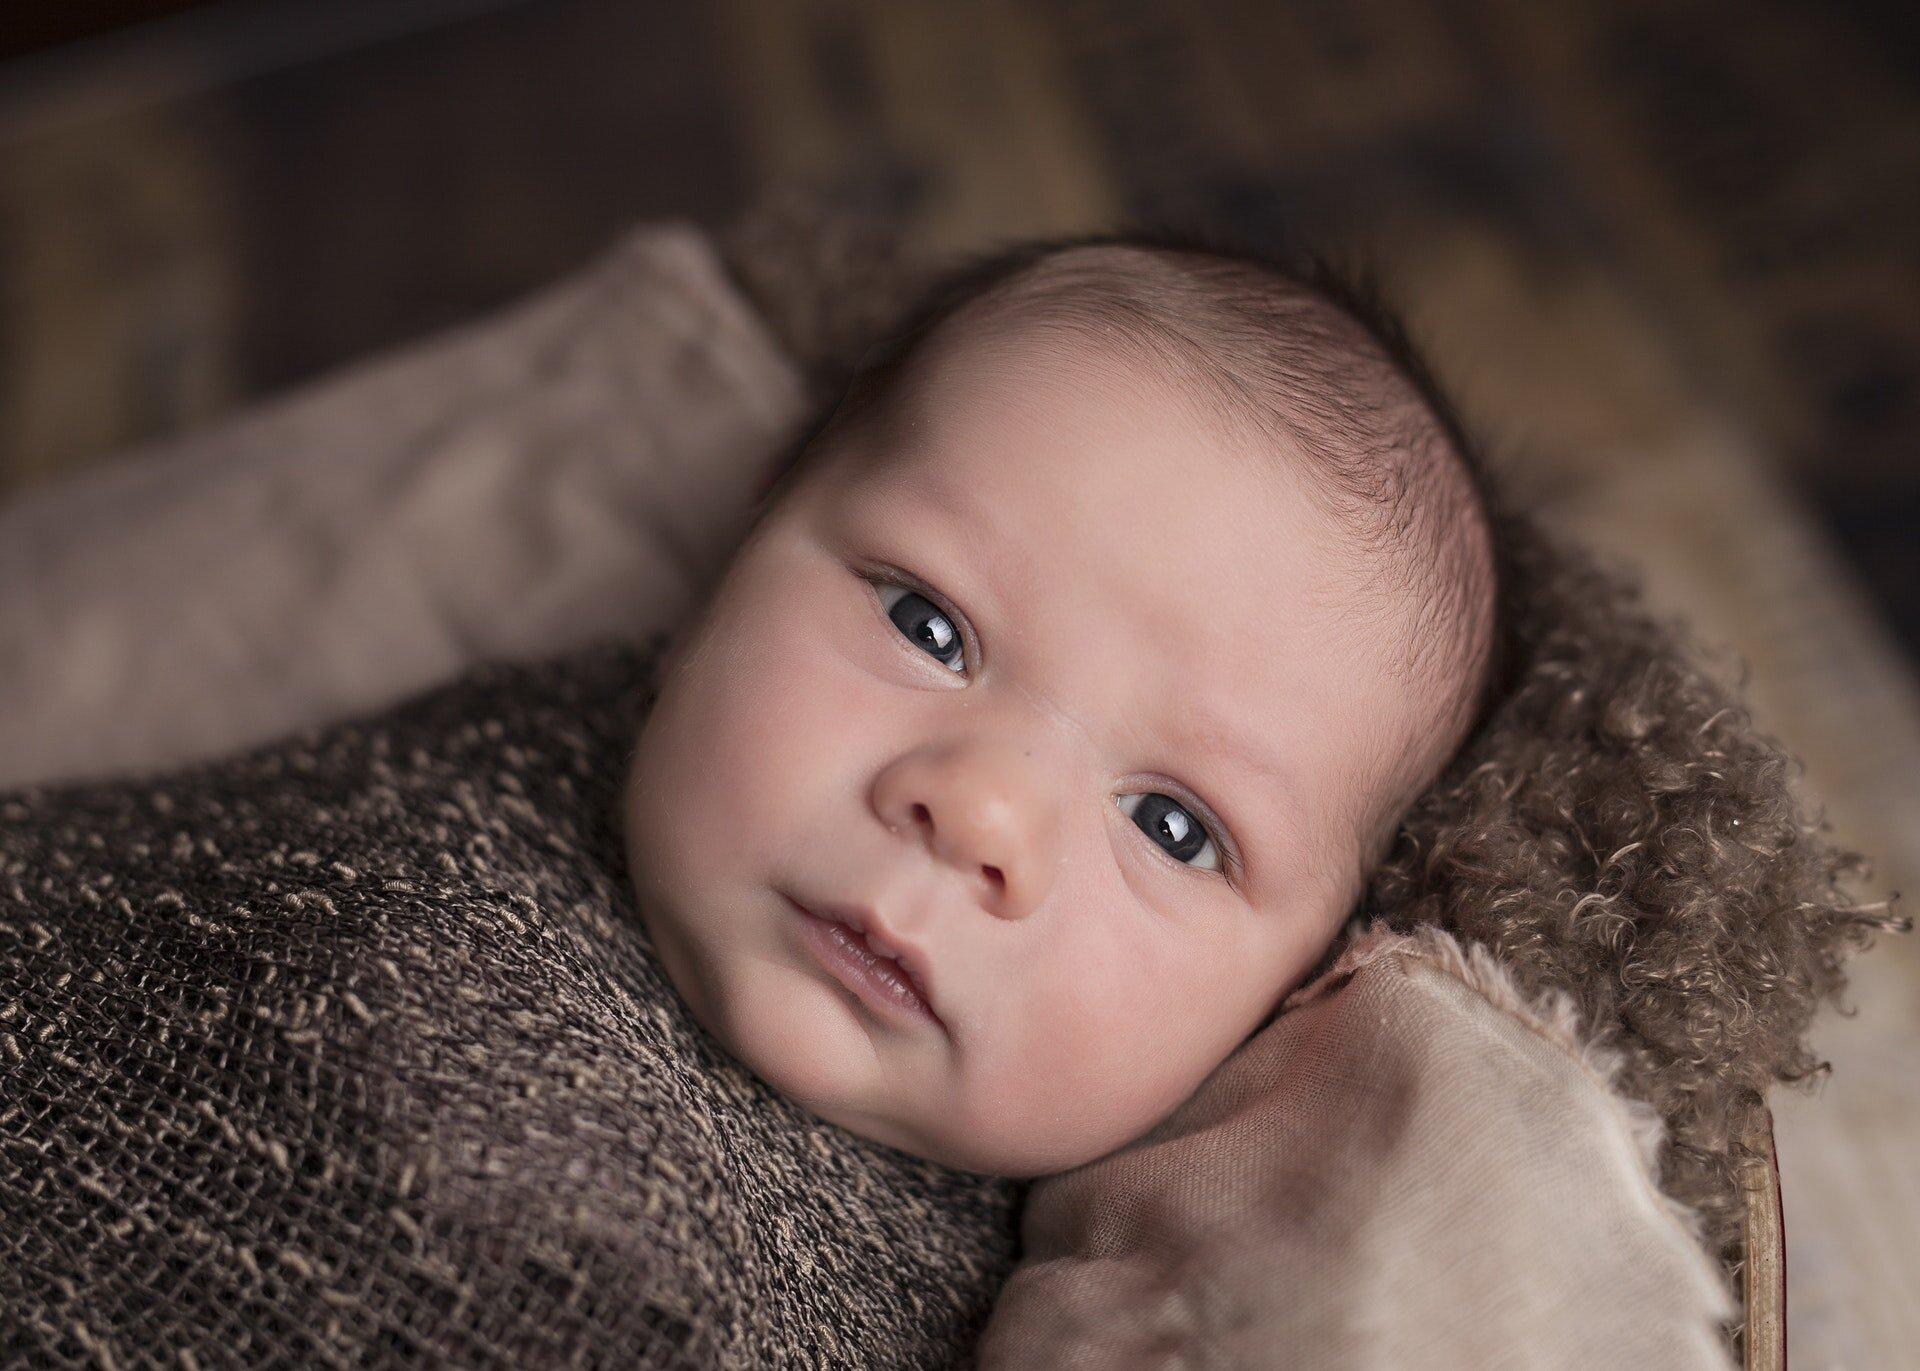 Newborn photography | The Photographers Blog